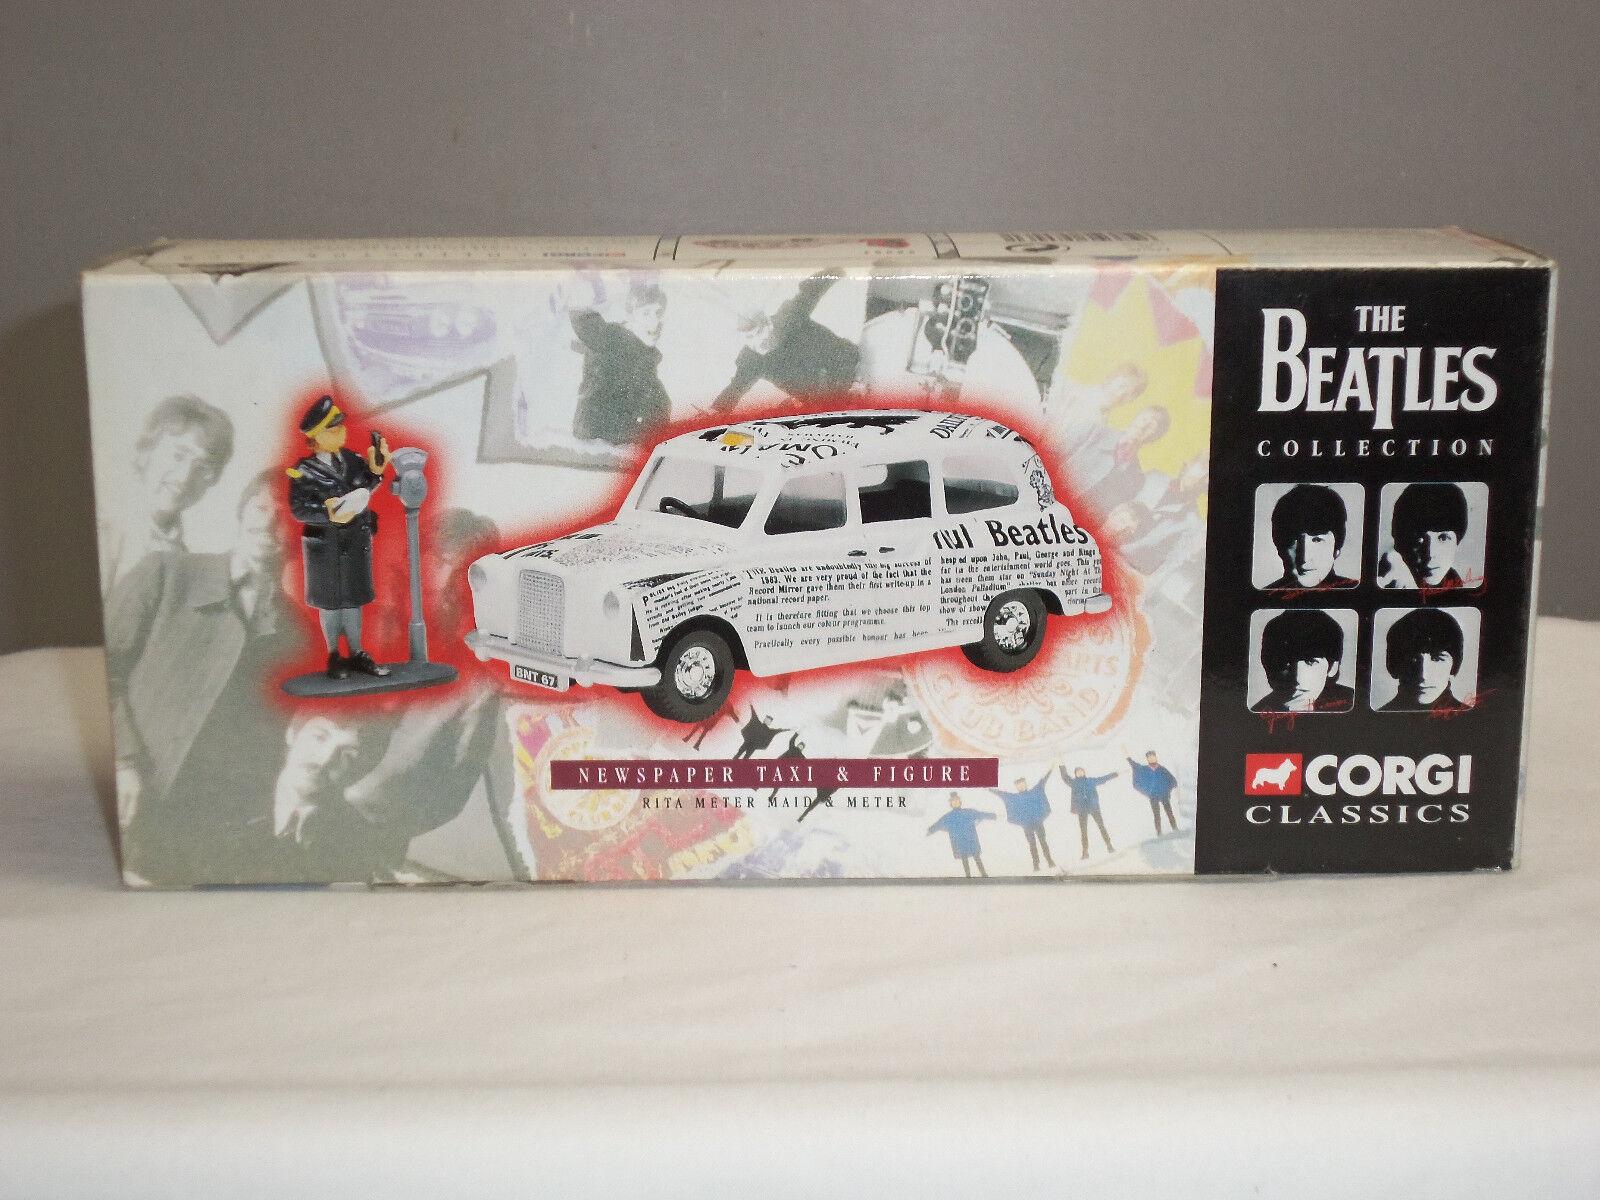 Corgi Beatles Newspaper Taxi blancoo 58003 Taxi Londres Coche + tráfico alcalde figura